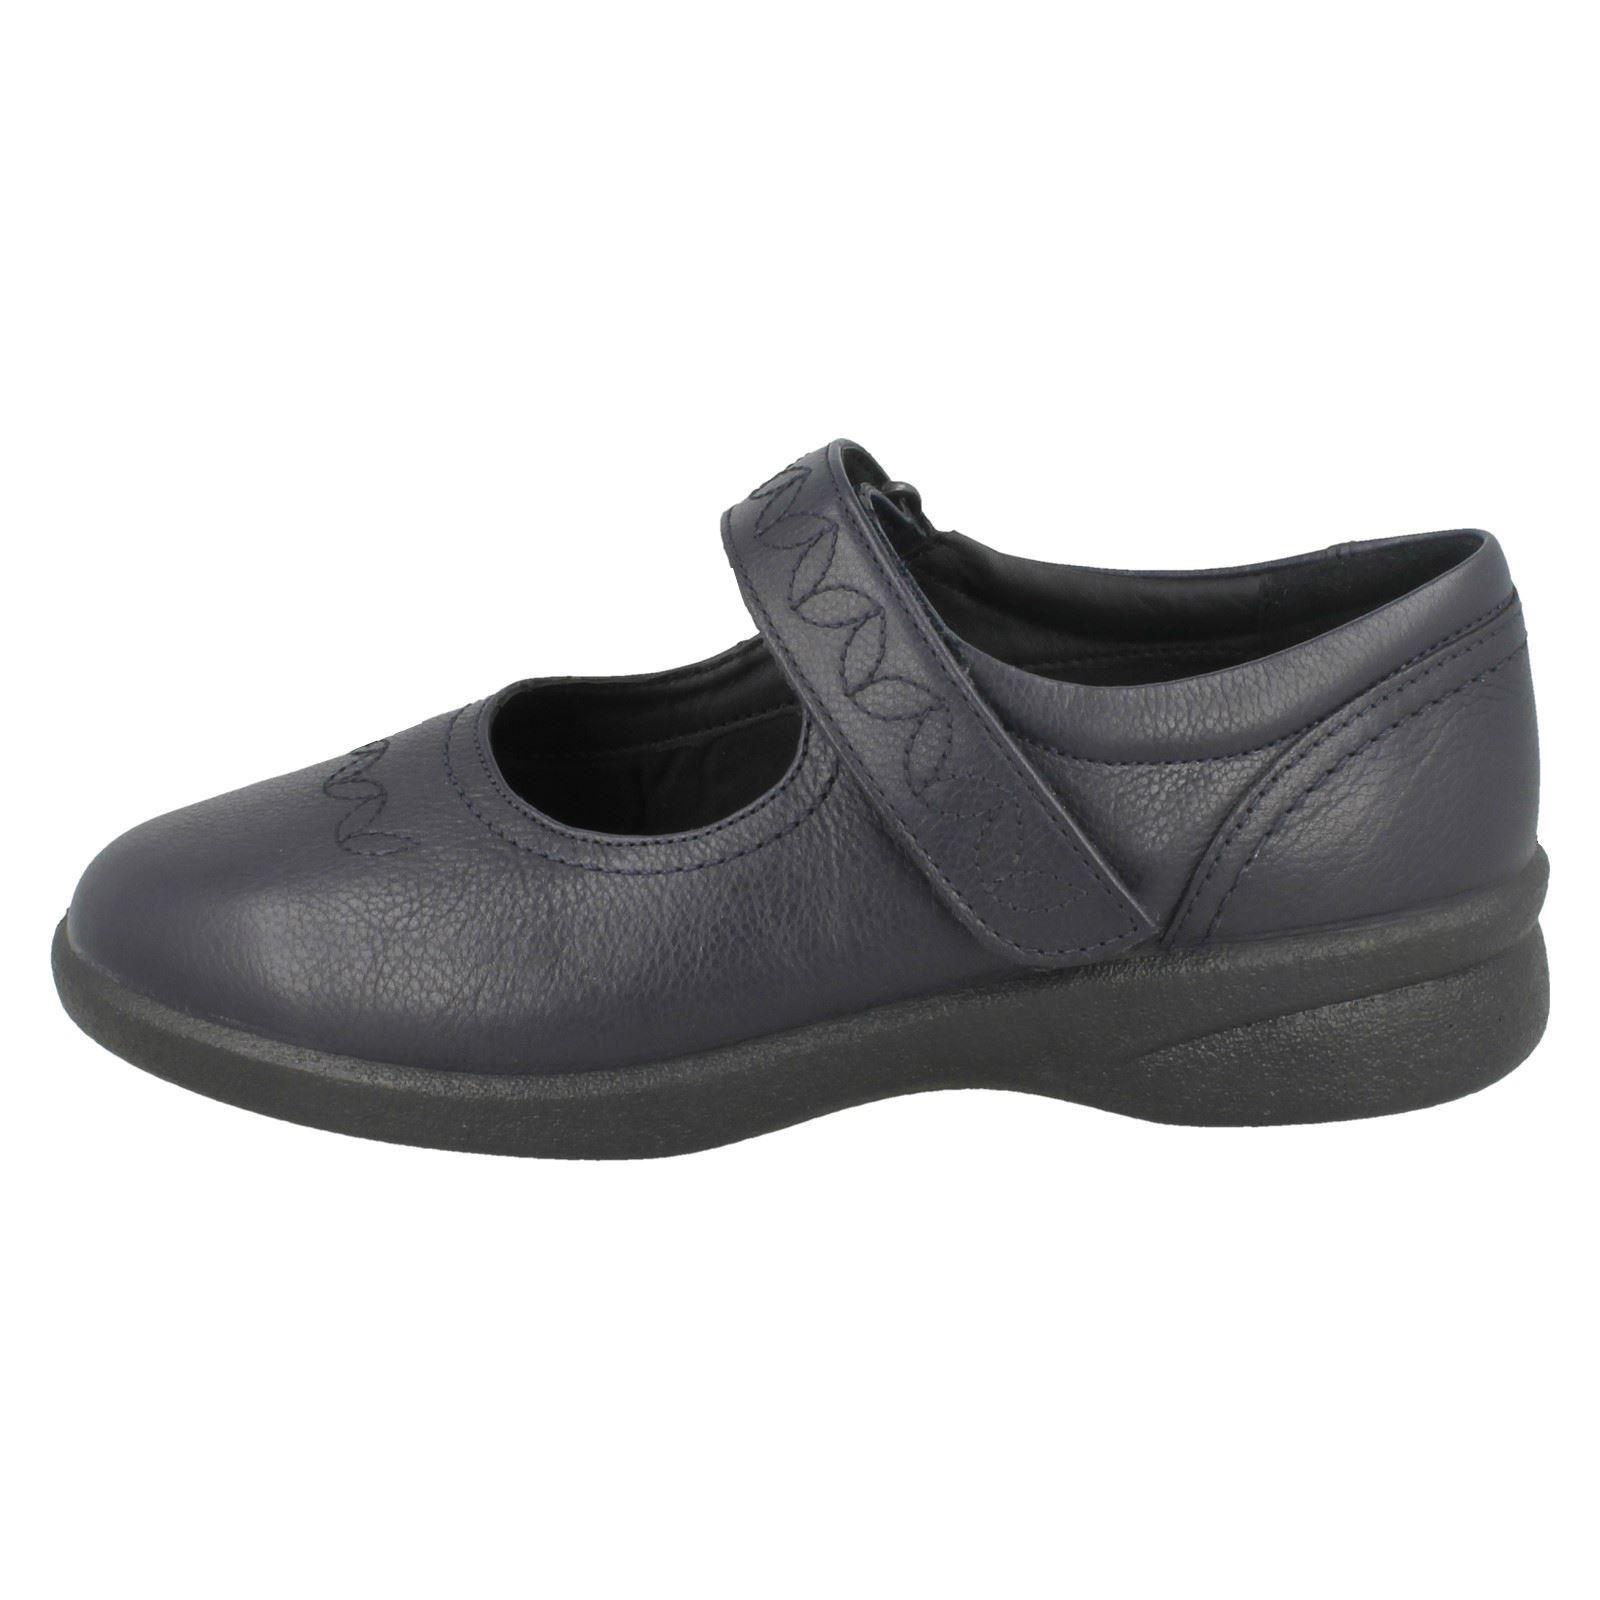 Damen Padders Kobold Doppel Passform Schuhe - Kobold Padders 2 a2b095